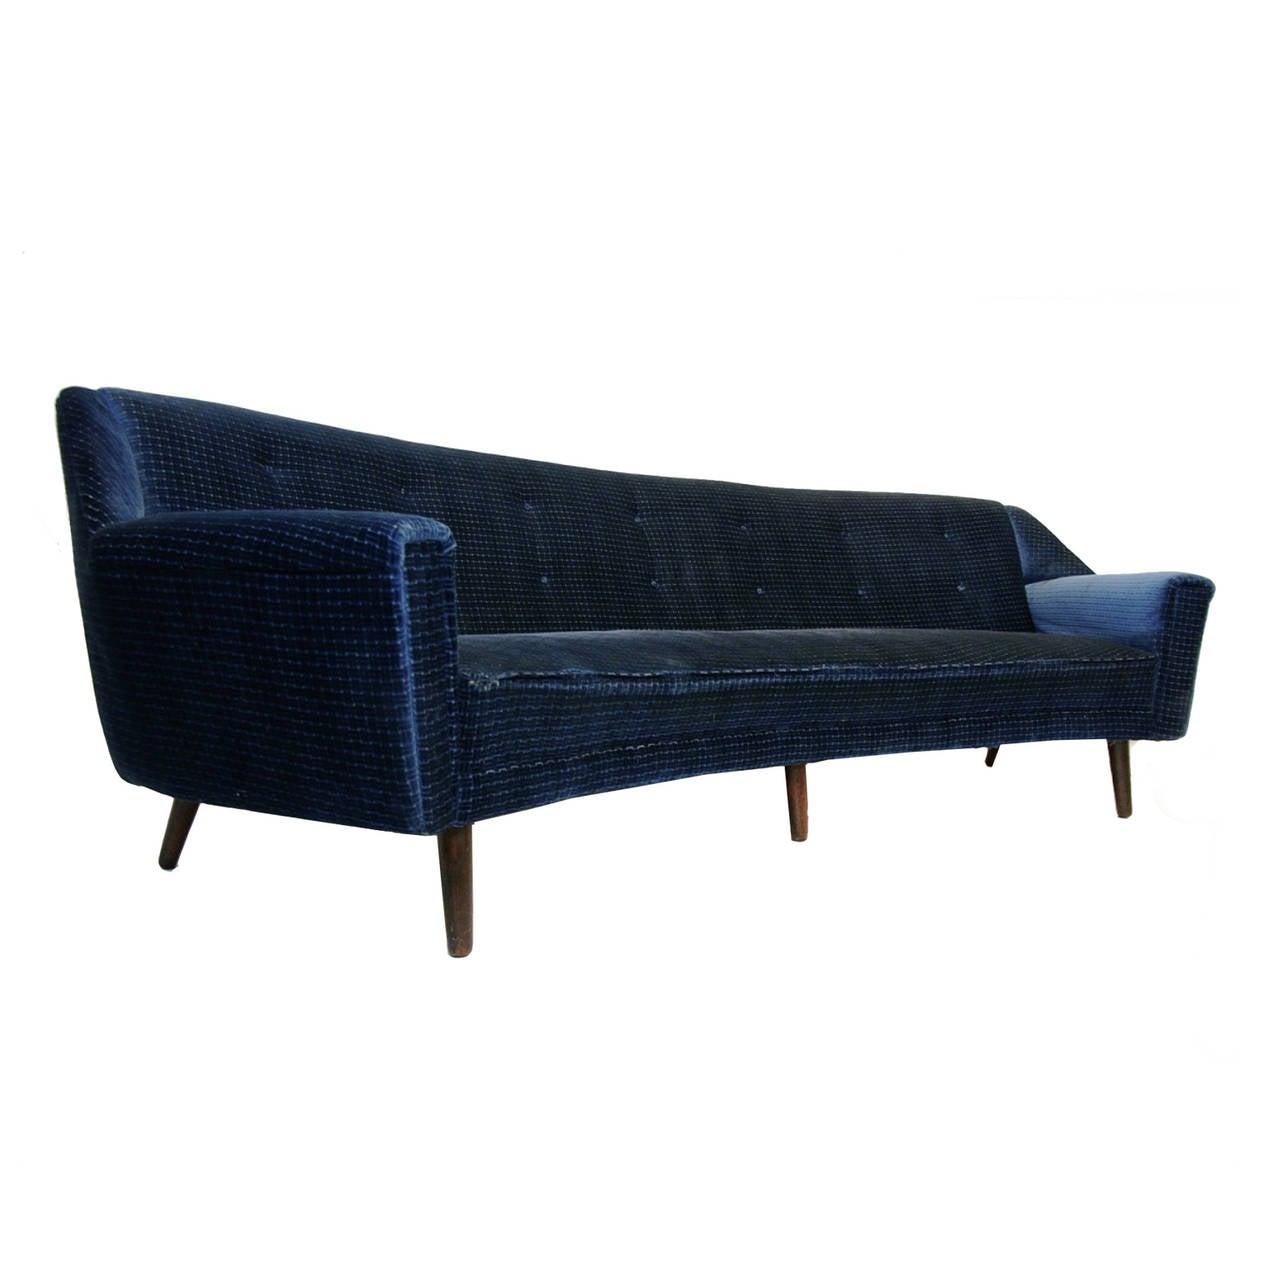 Rare Kurt Ostervig for Henry Rolschau Mobler Curved Sofa For Sale